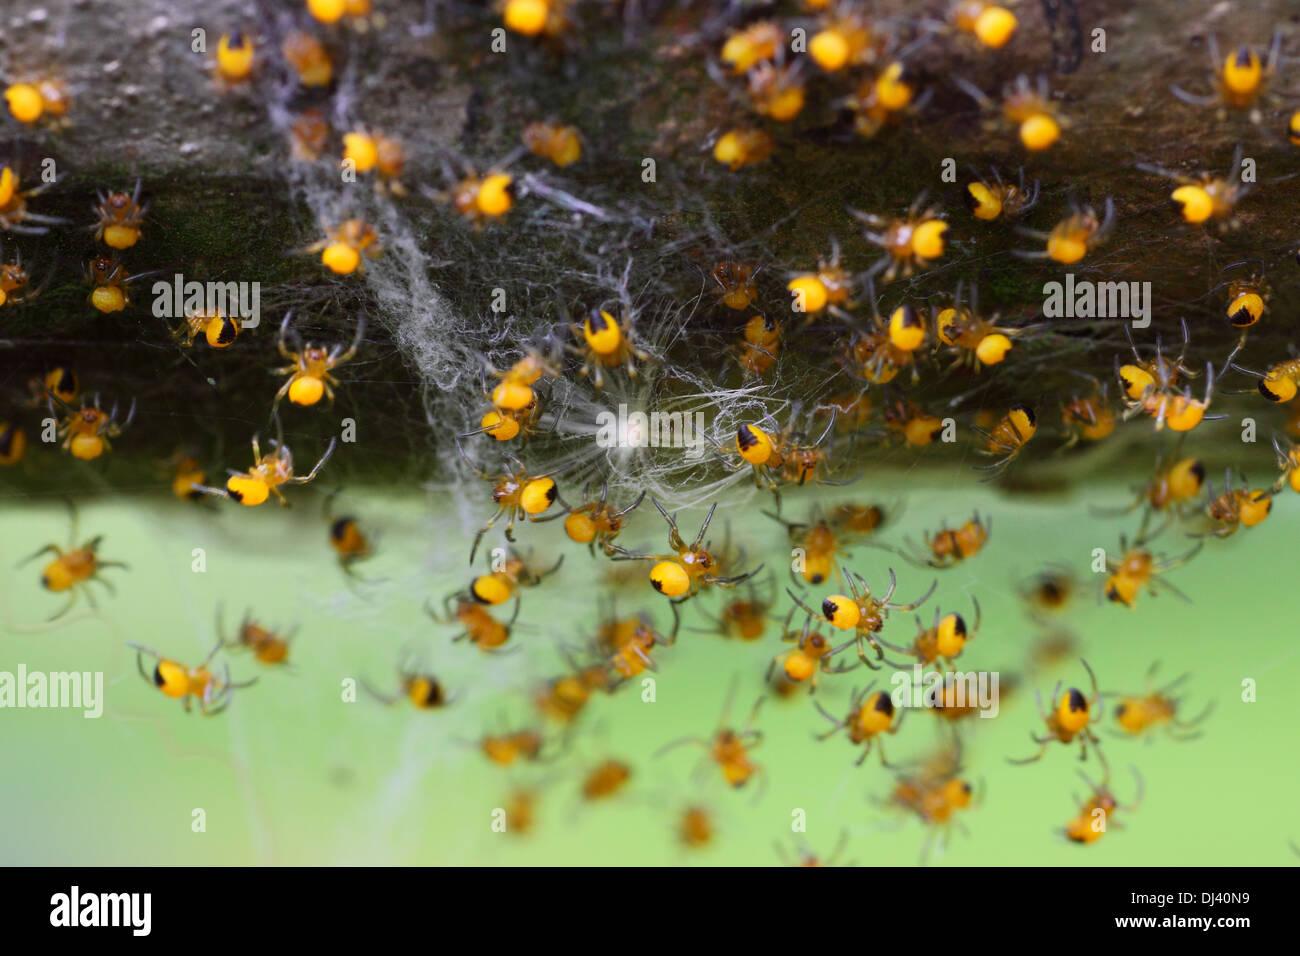 arachnids - Stock Image